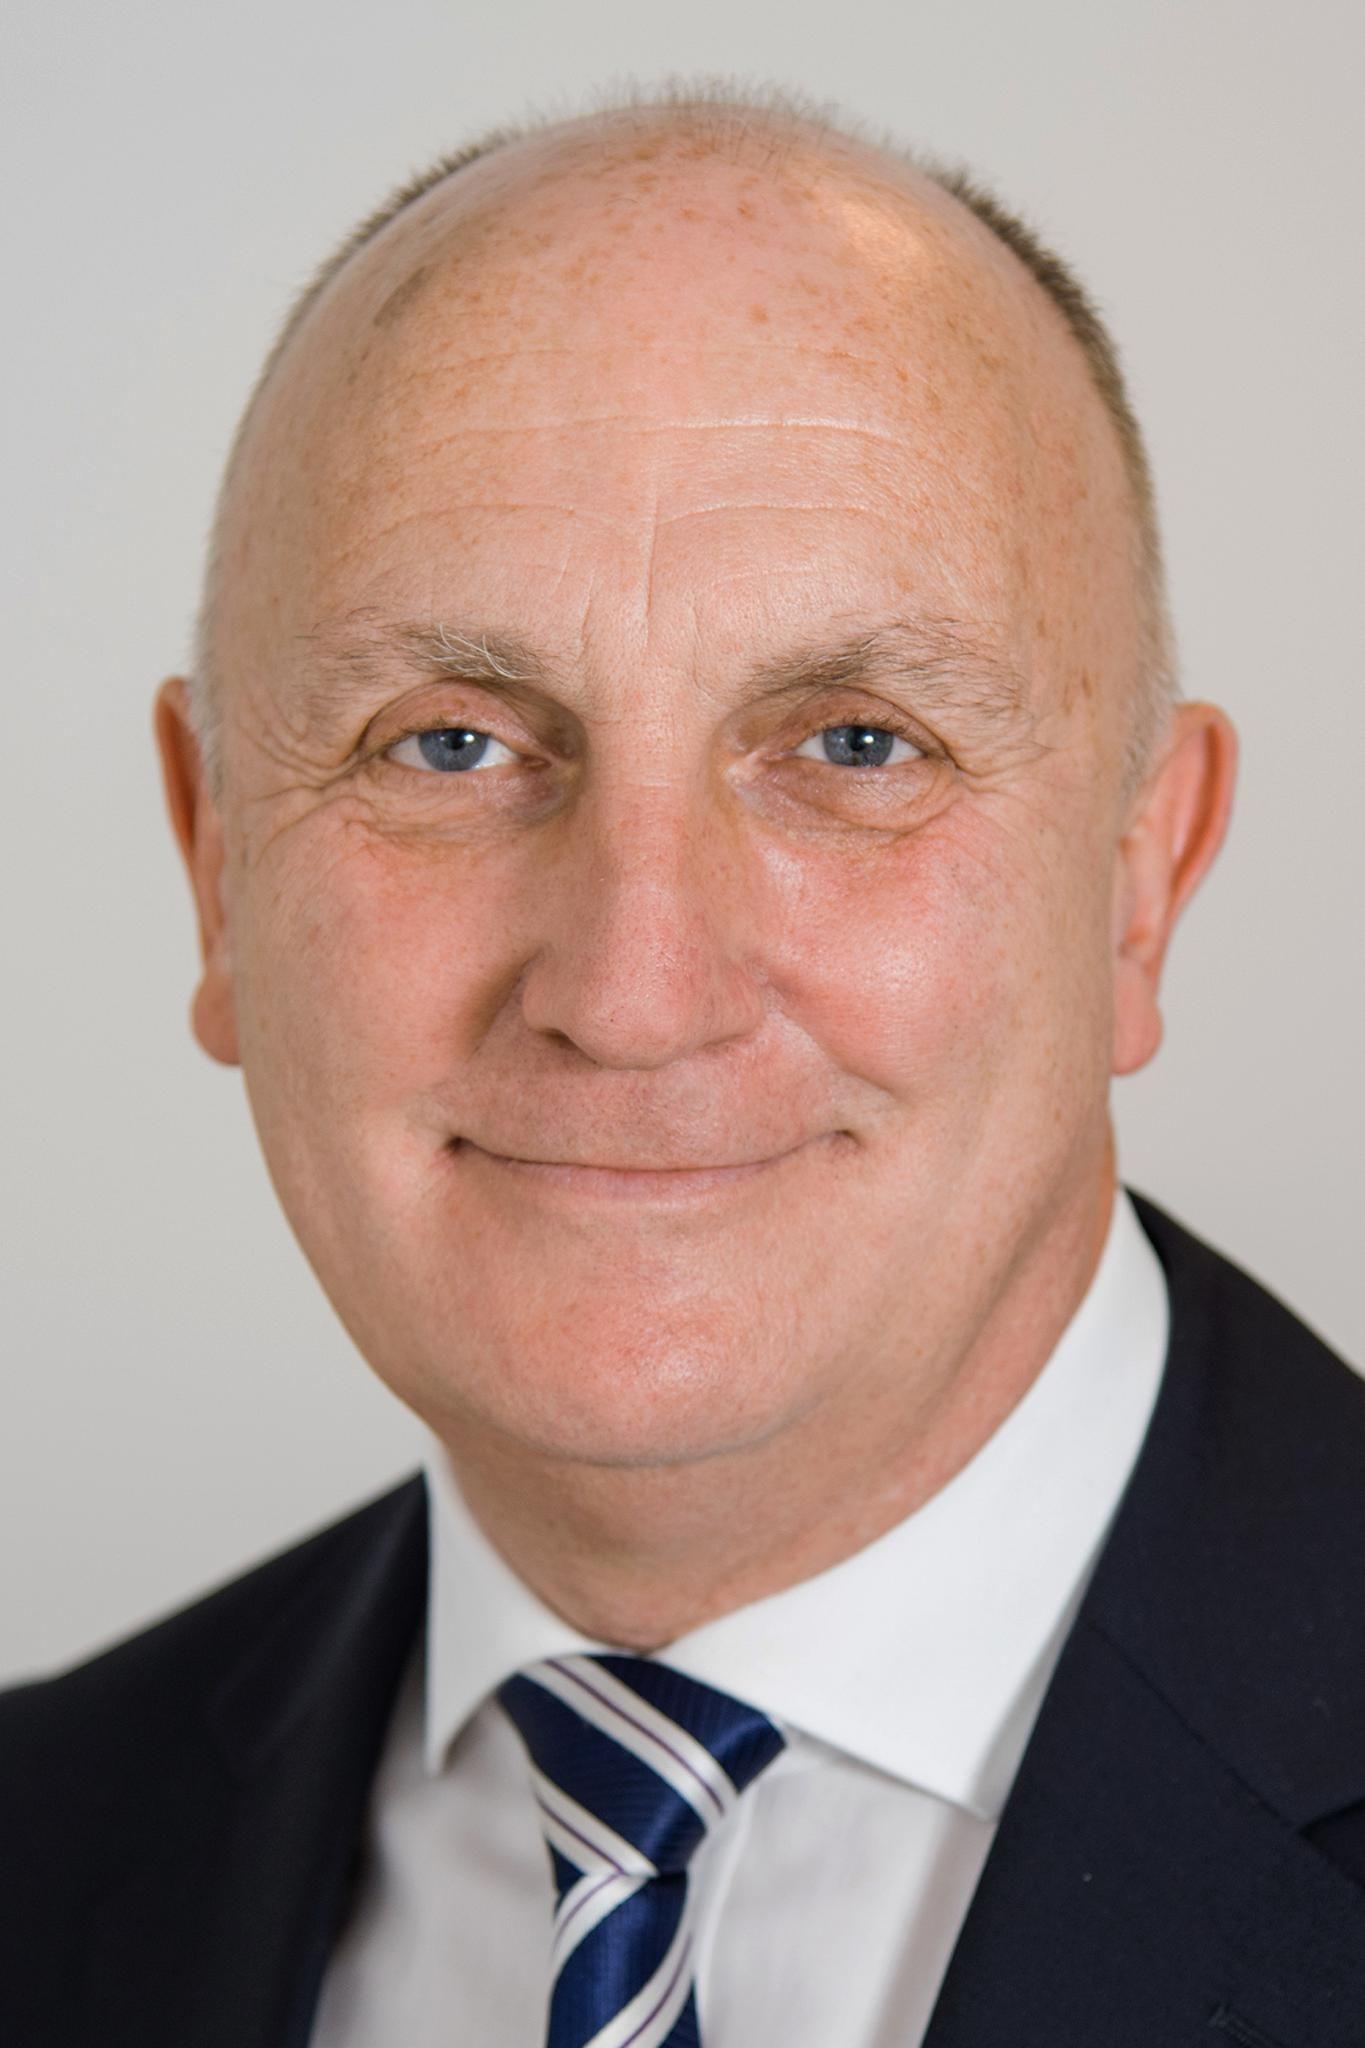 Stephen Phipson